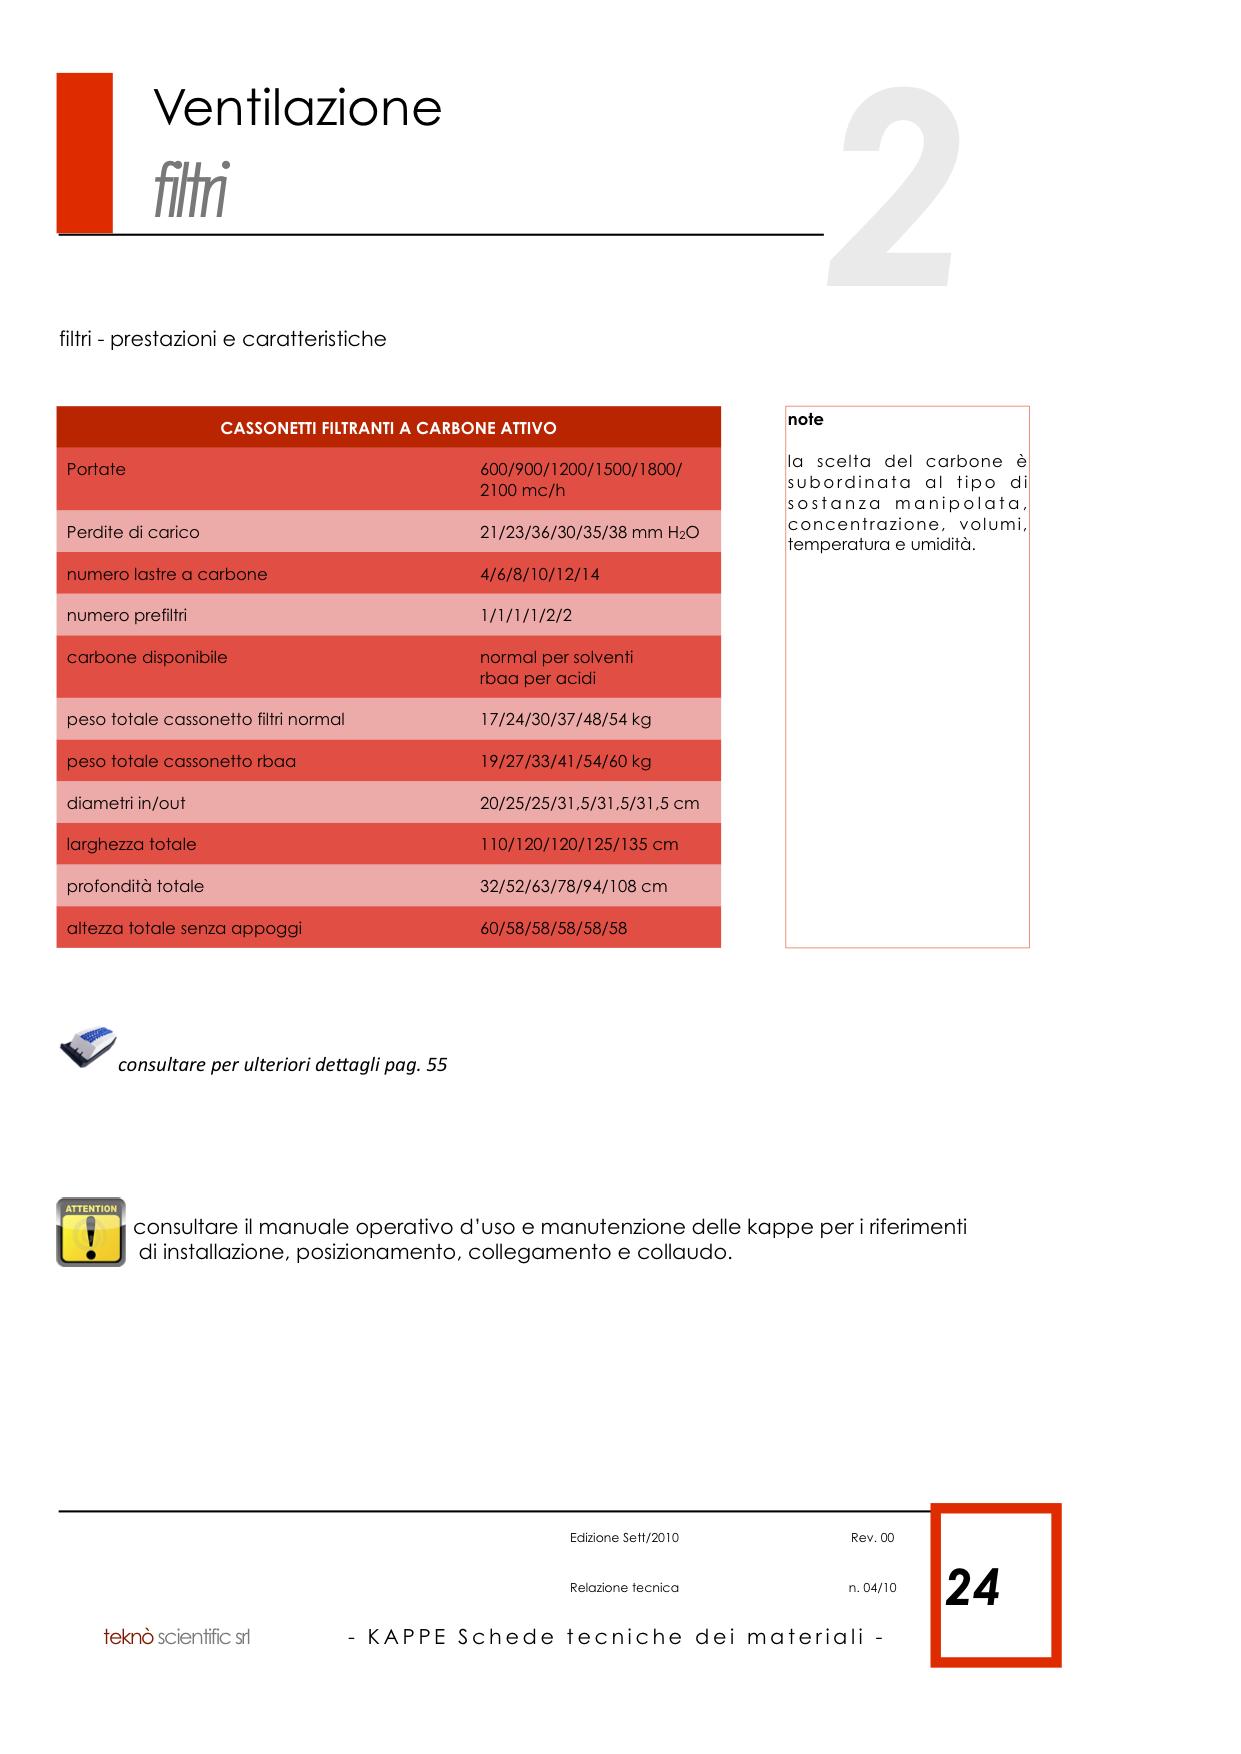 KAPPE Schede tecniche materiali copia 4.png